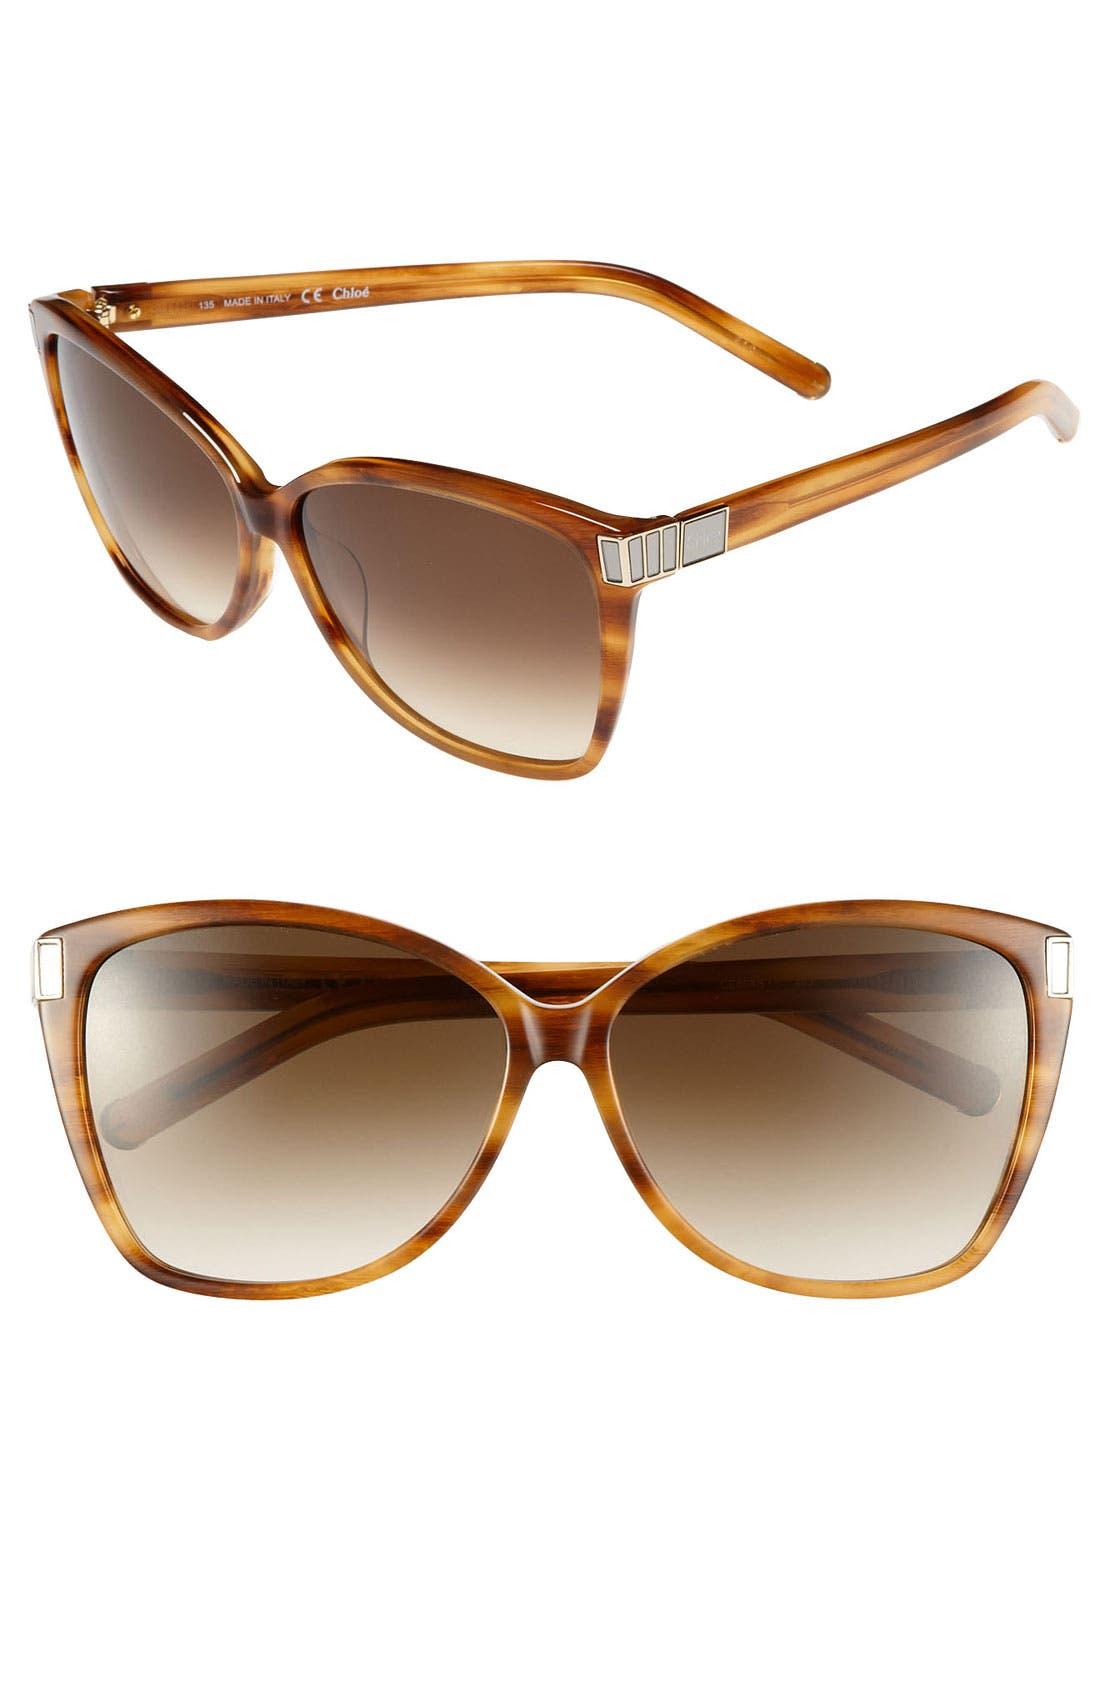 Main Image - Chloé 'Hoya' 59mm Sunglasses